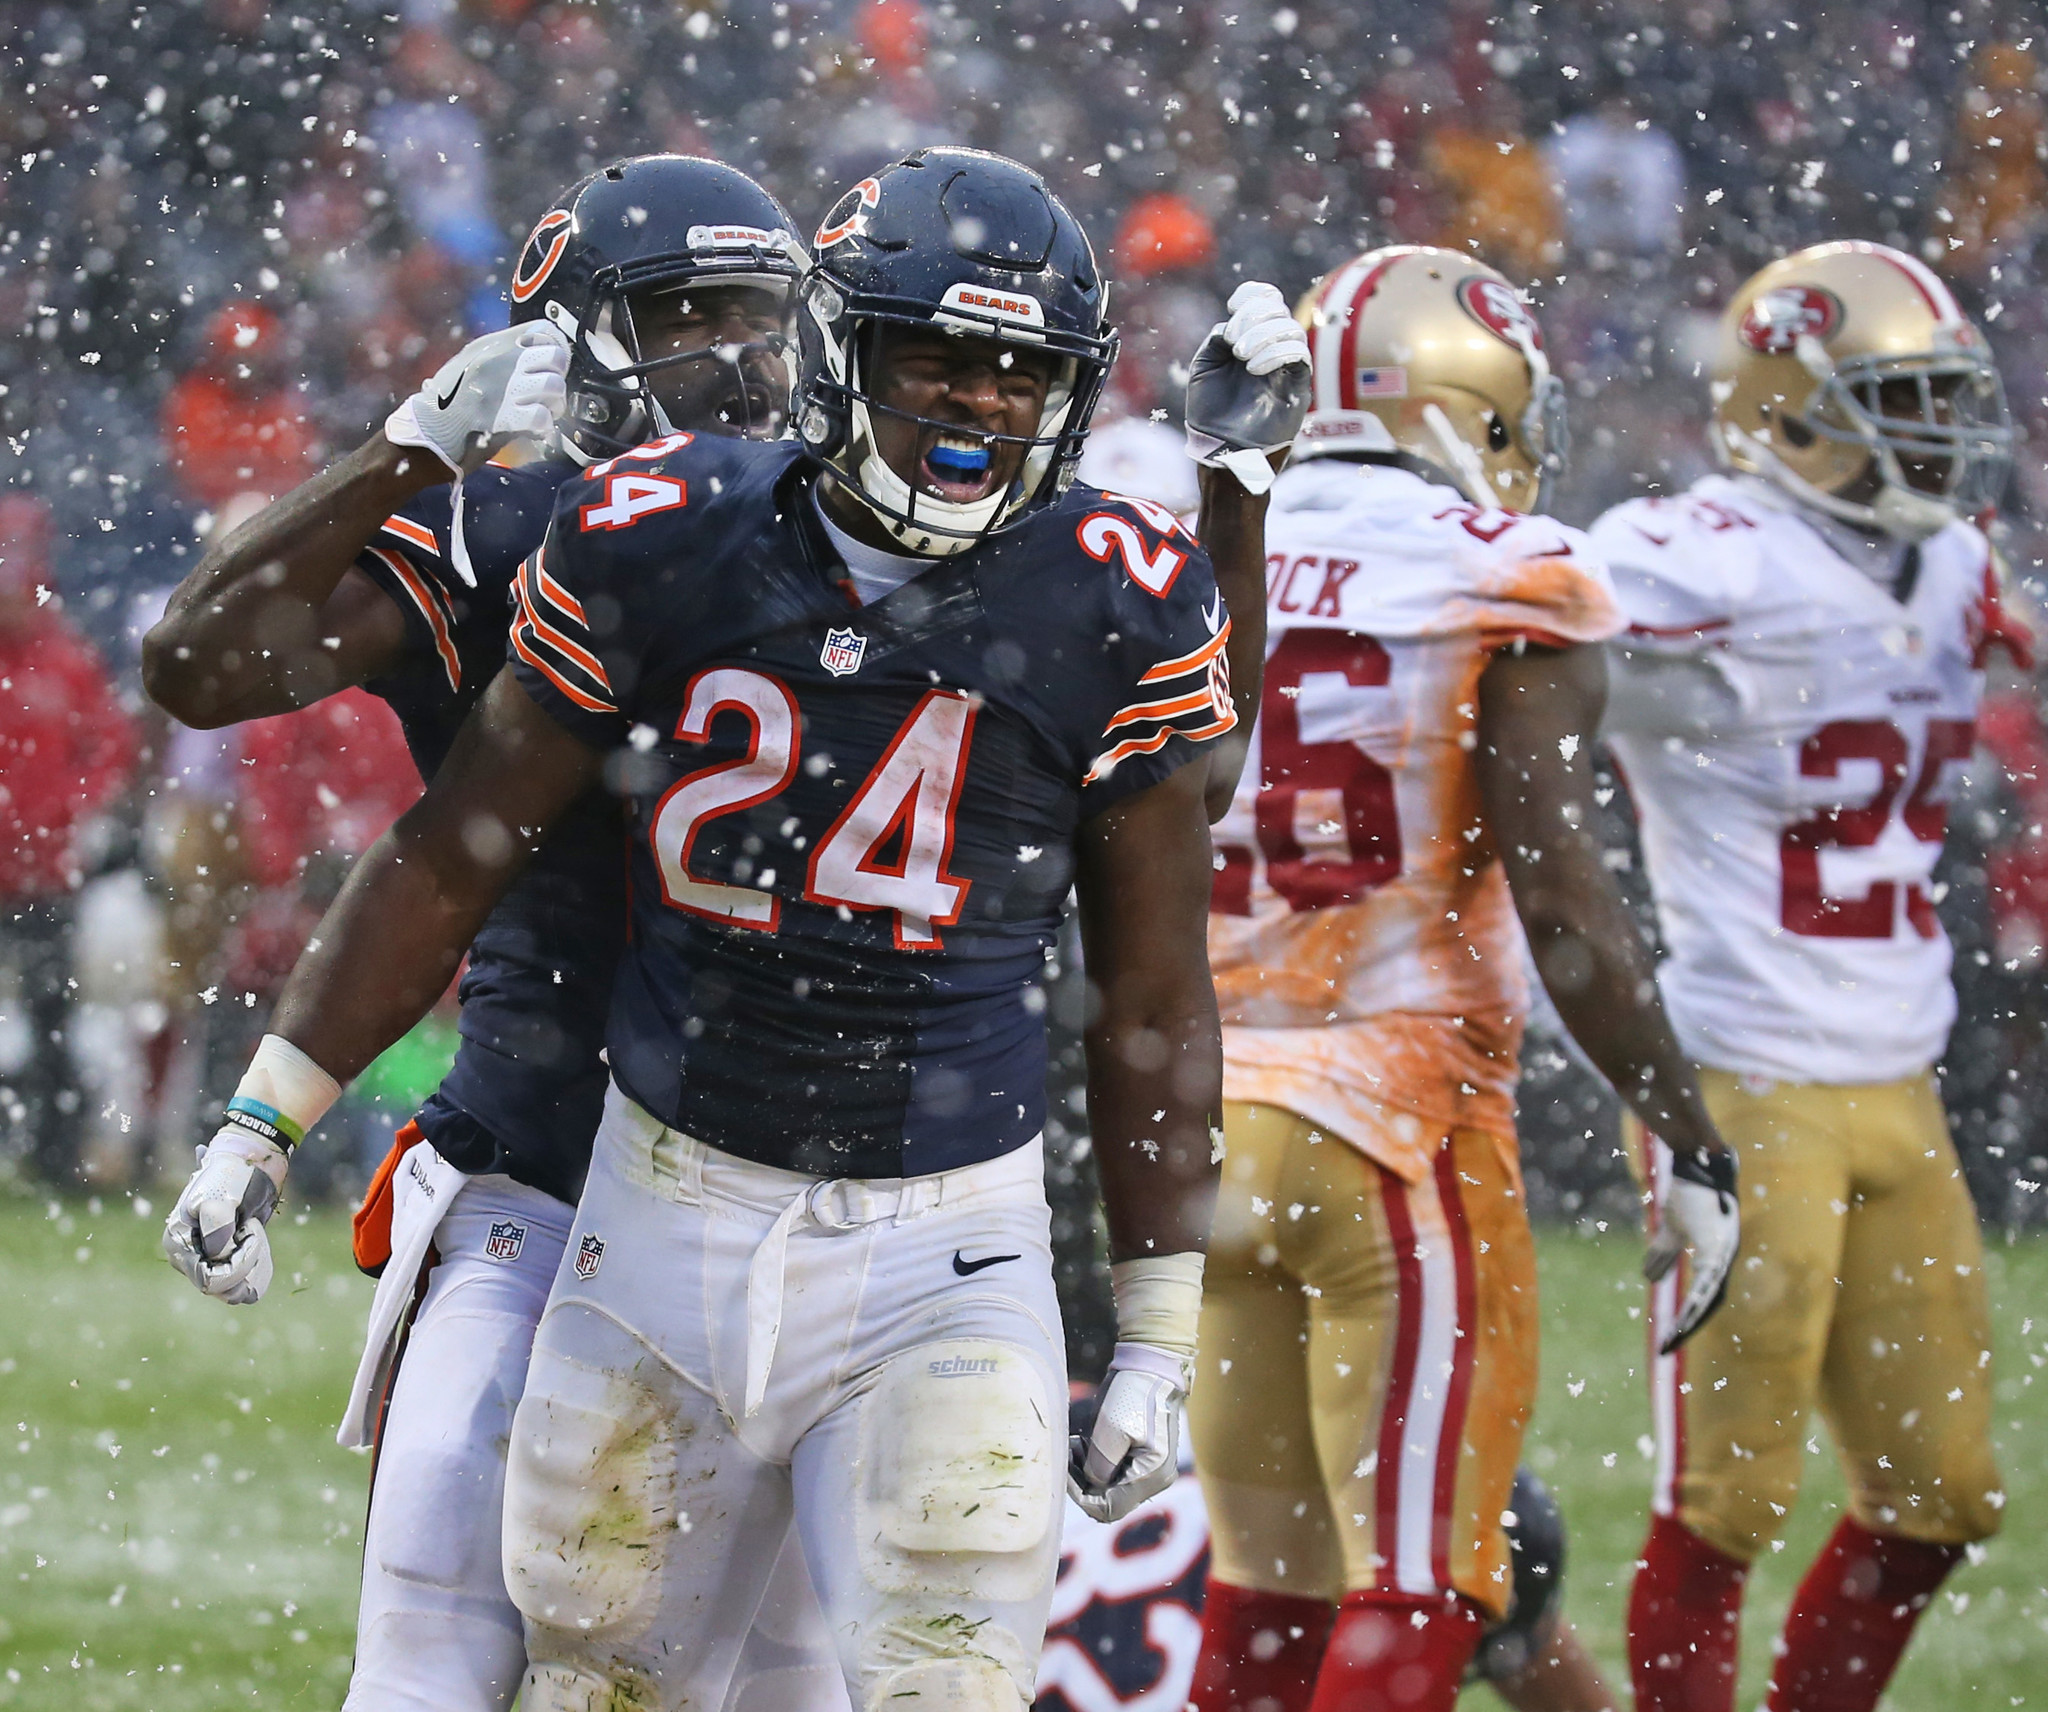 Bears continue to see progress in rookie RB Jordan Howard